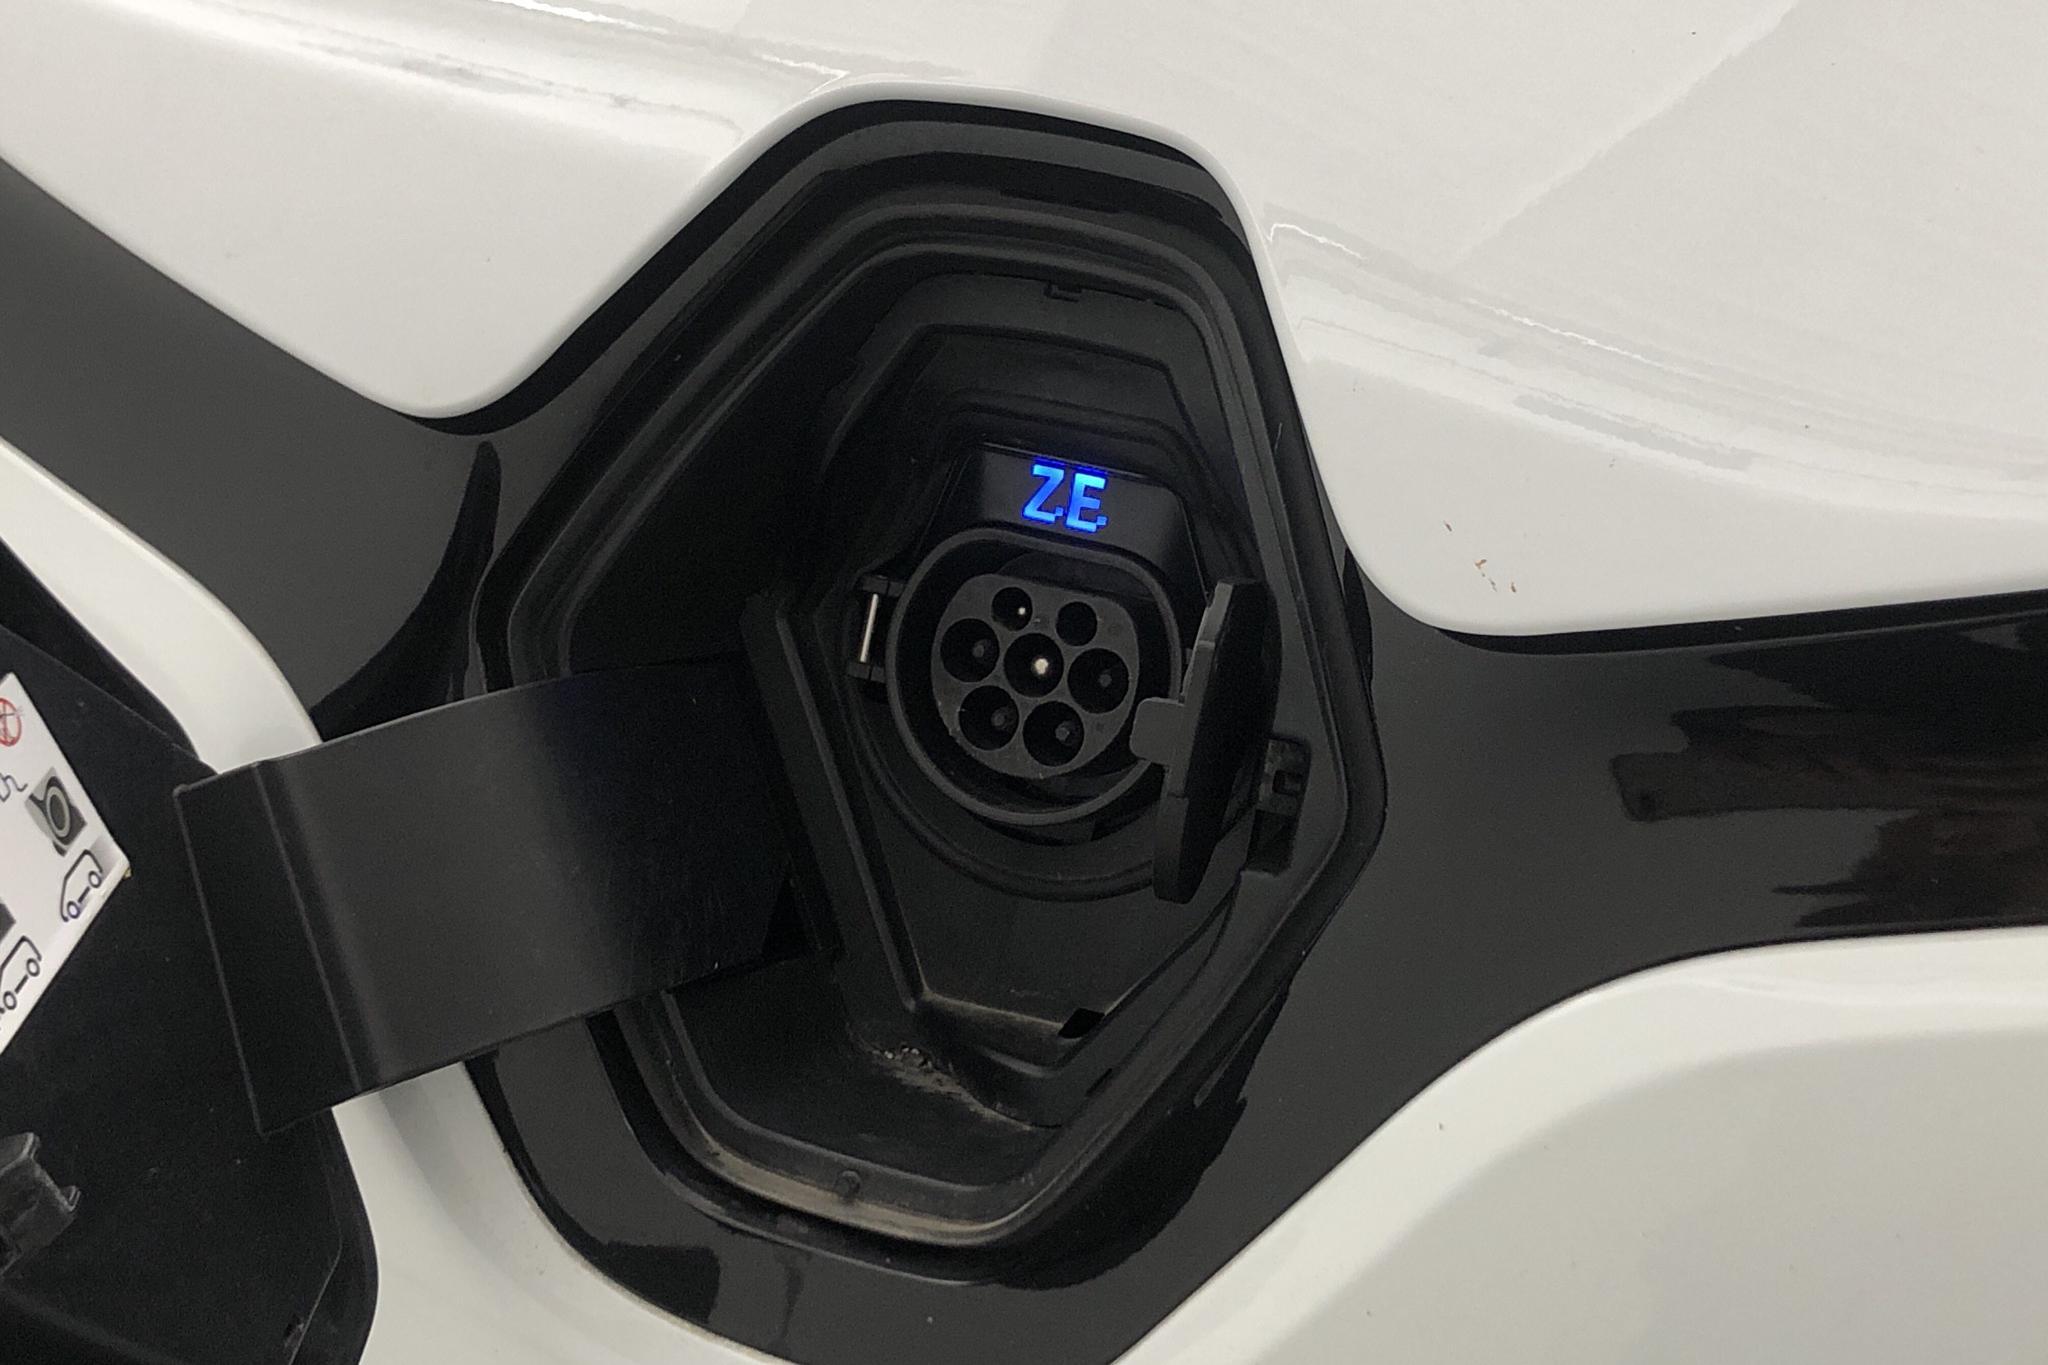 Renault Zoe 41 kWh R110 (108hk) - 28 770 km - Automatic - white - 2019